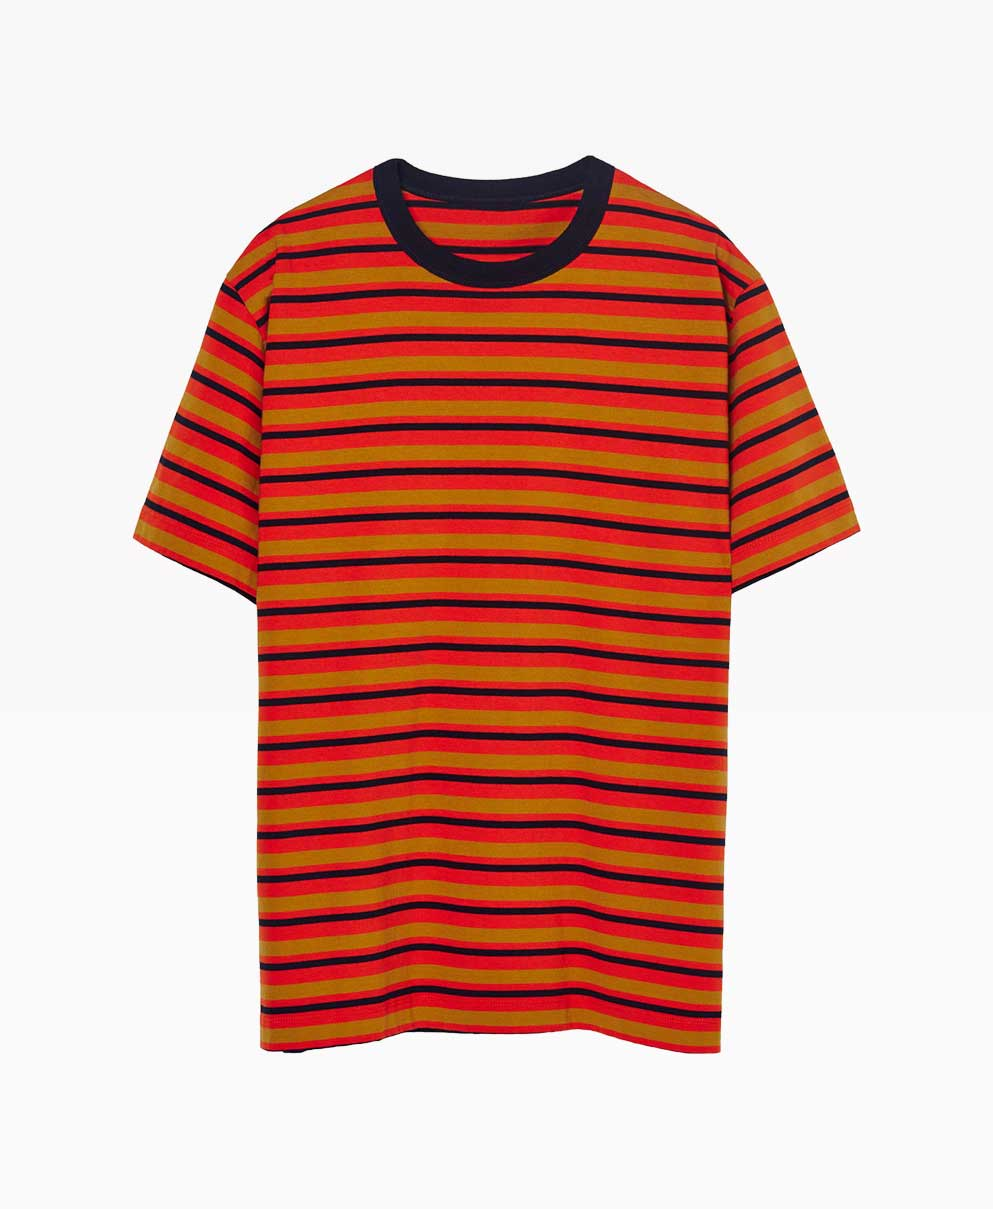 Loreak Mendian Ts Mate L Lo Jersey Tee Stripes Front